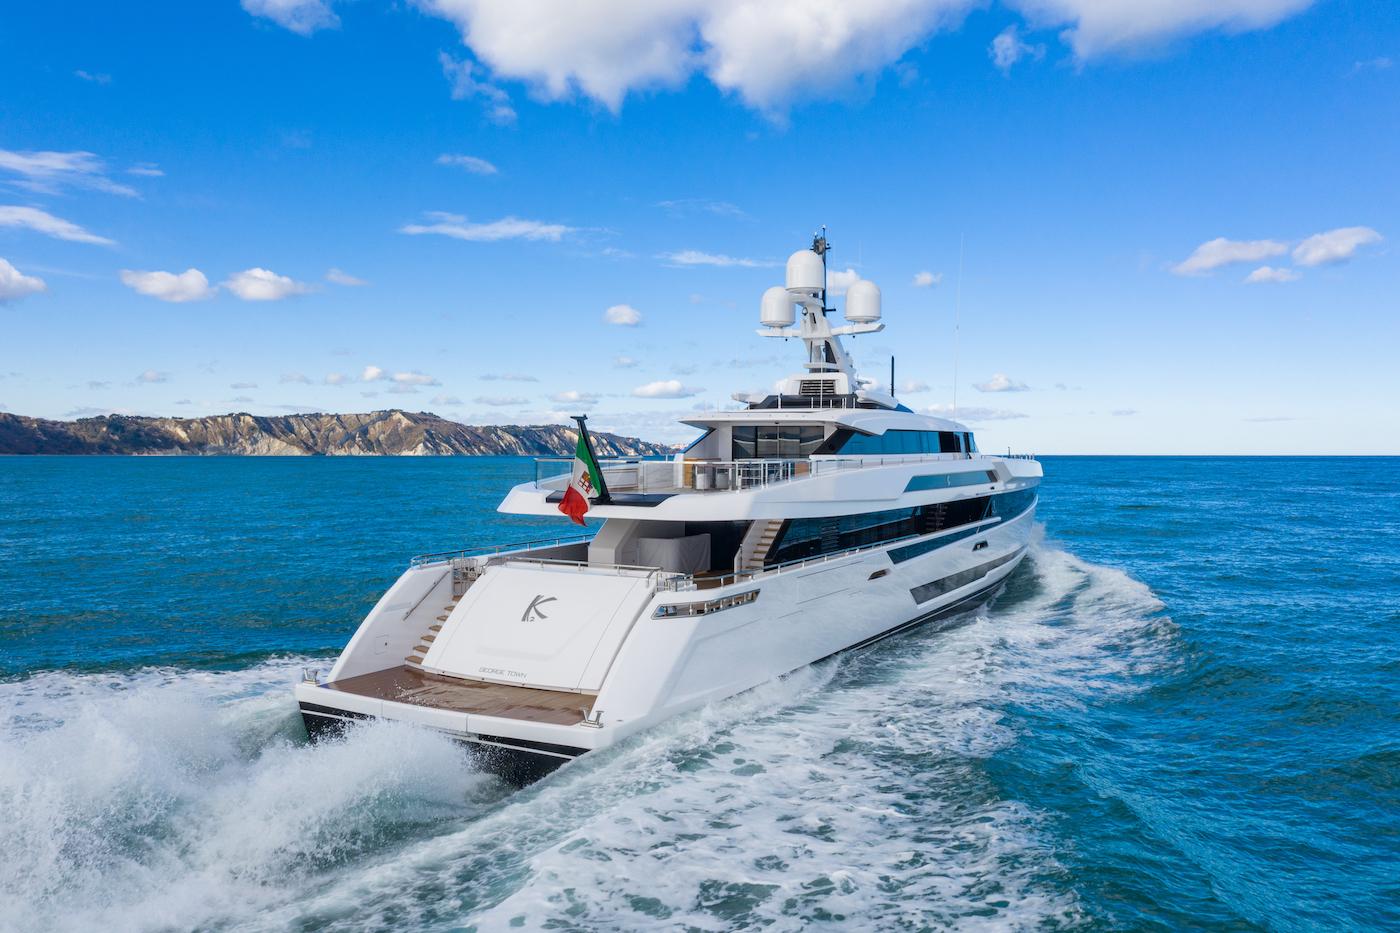 Columbus Sport 50 superyacht K2